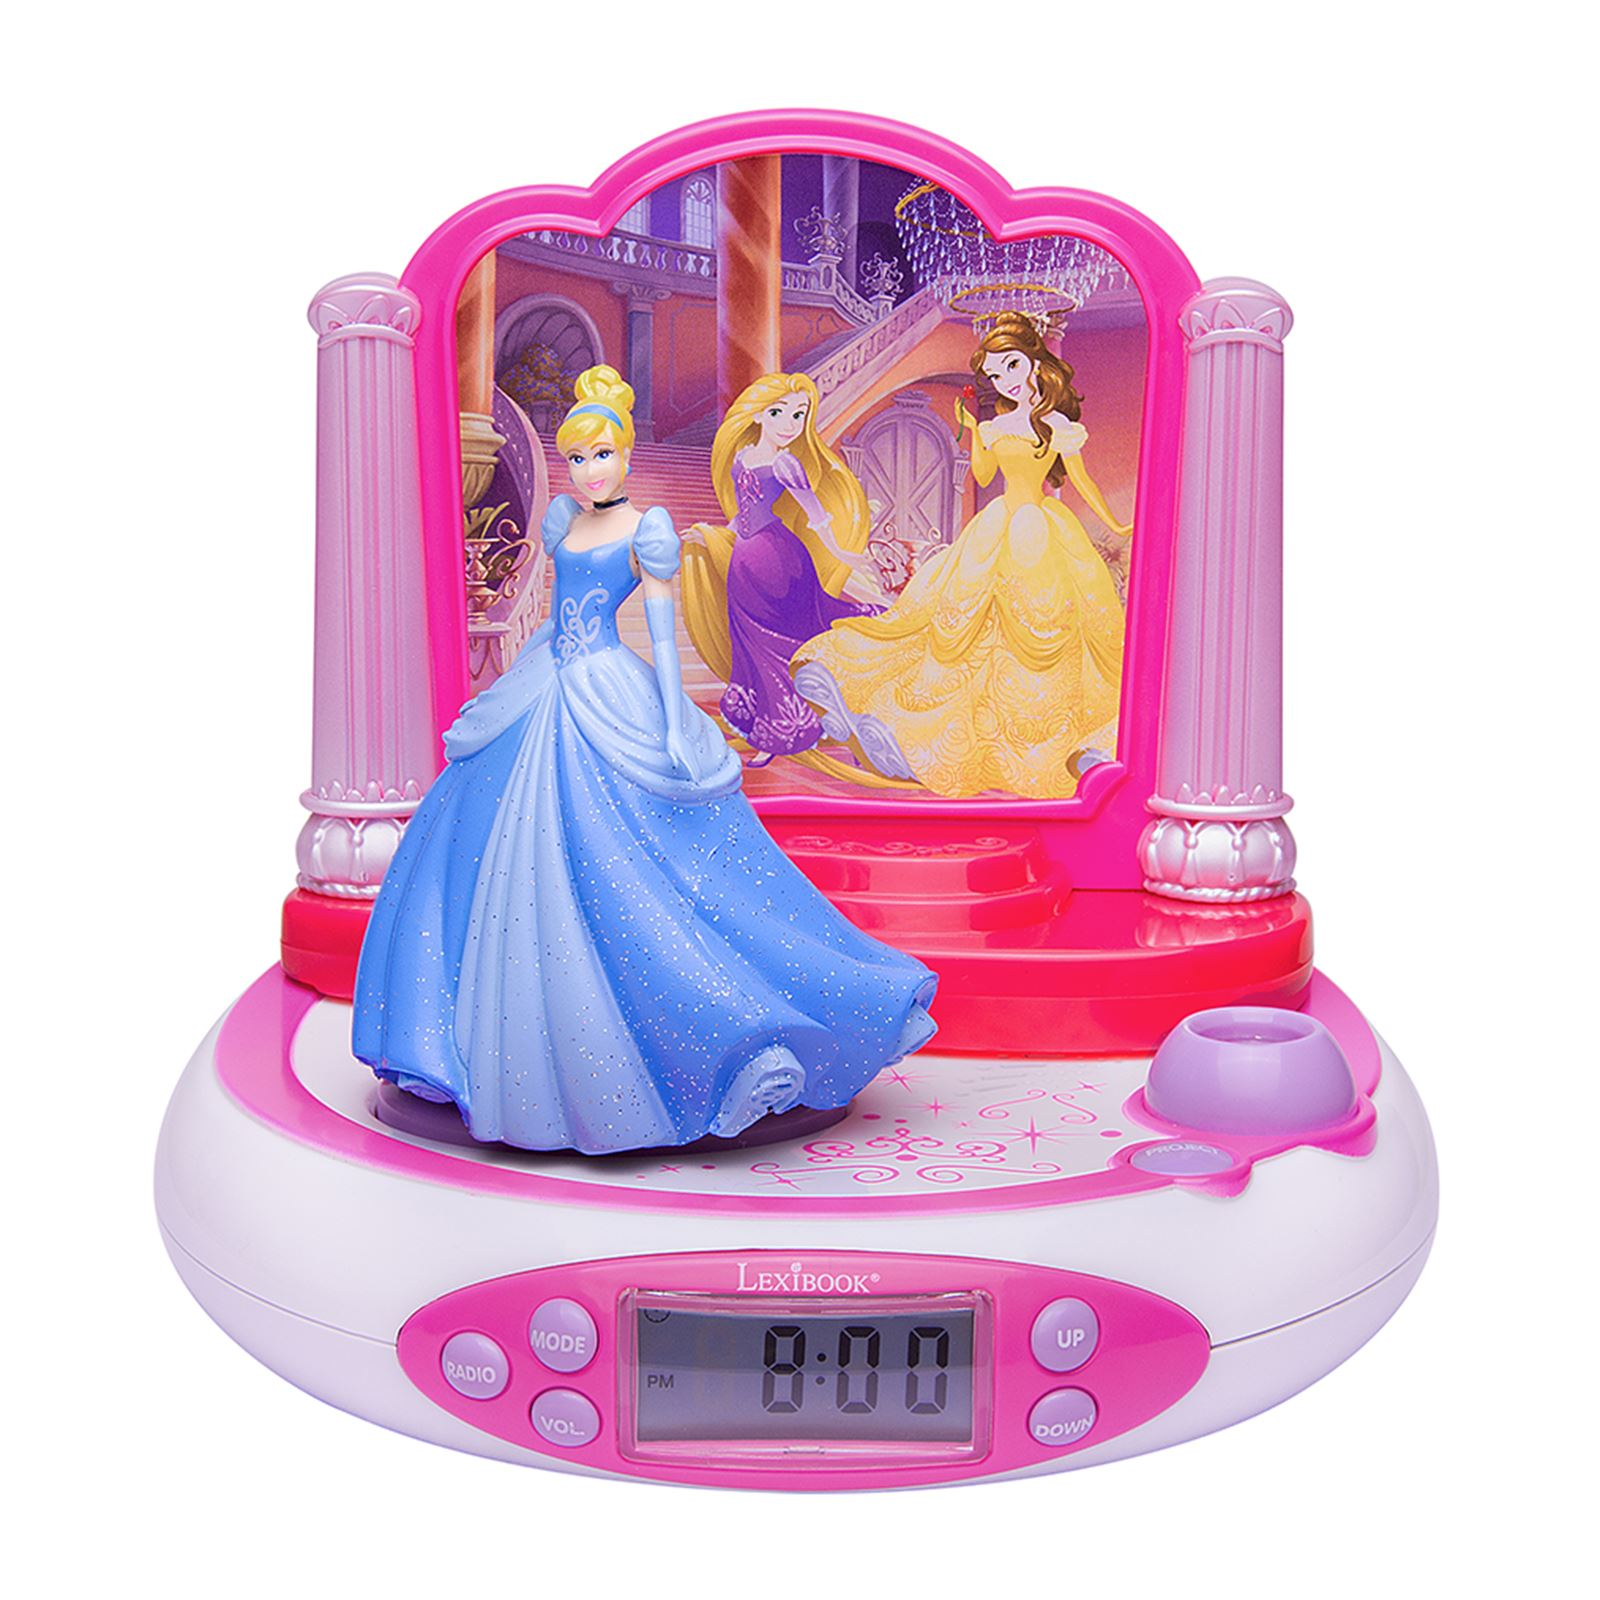 disney princess projector alarm clock radio 100 official kids new ebay. Black Bedroom Furniture Sets. Home Design Ideas